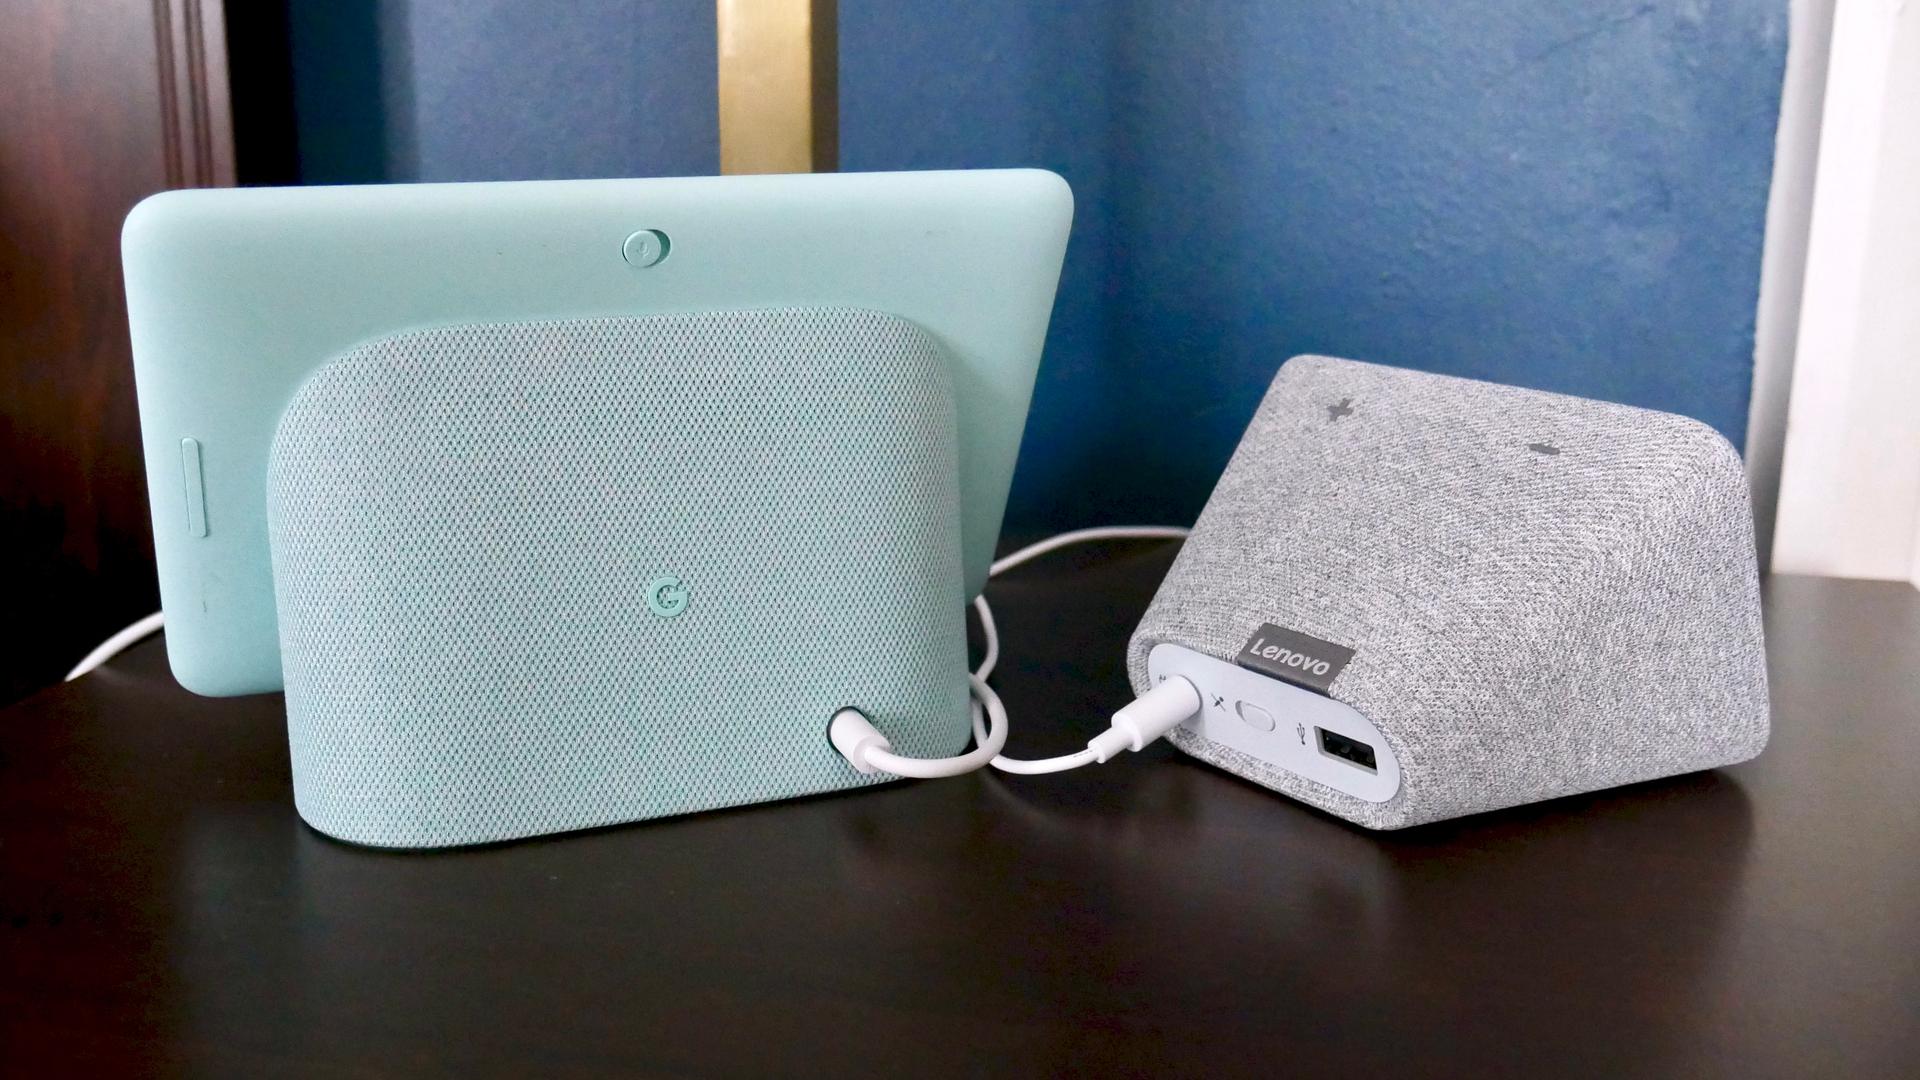 Lenovo Smart Clock vs Google Nest Hub rear